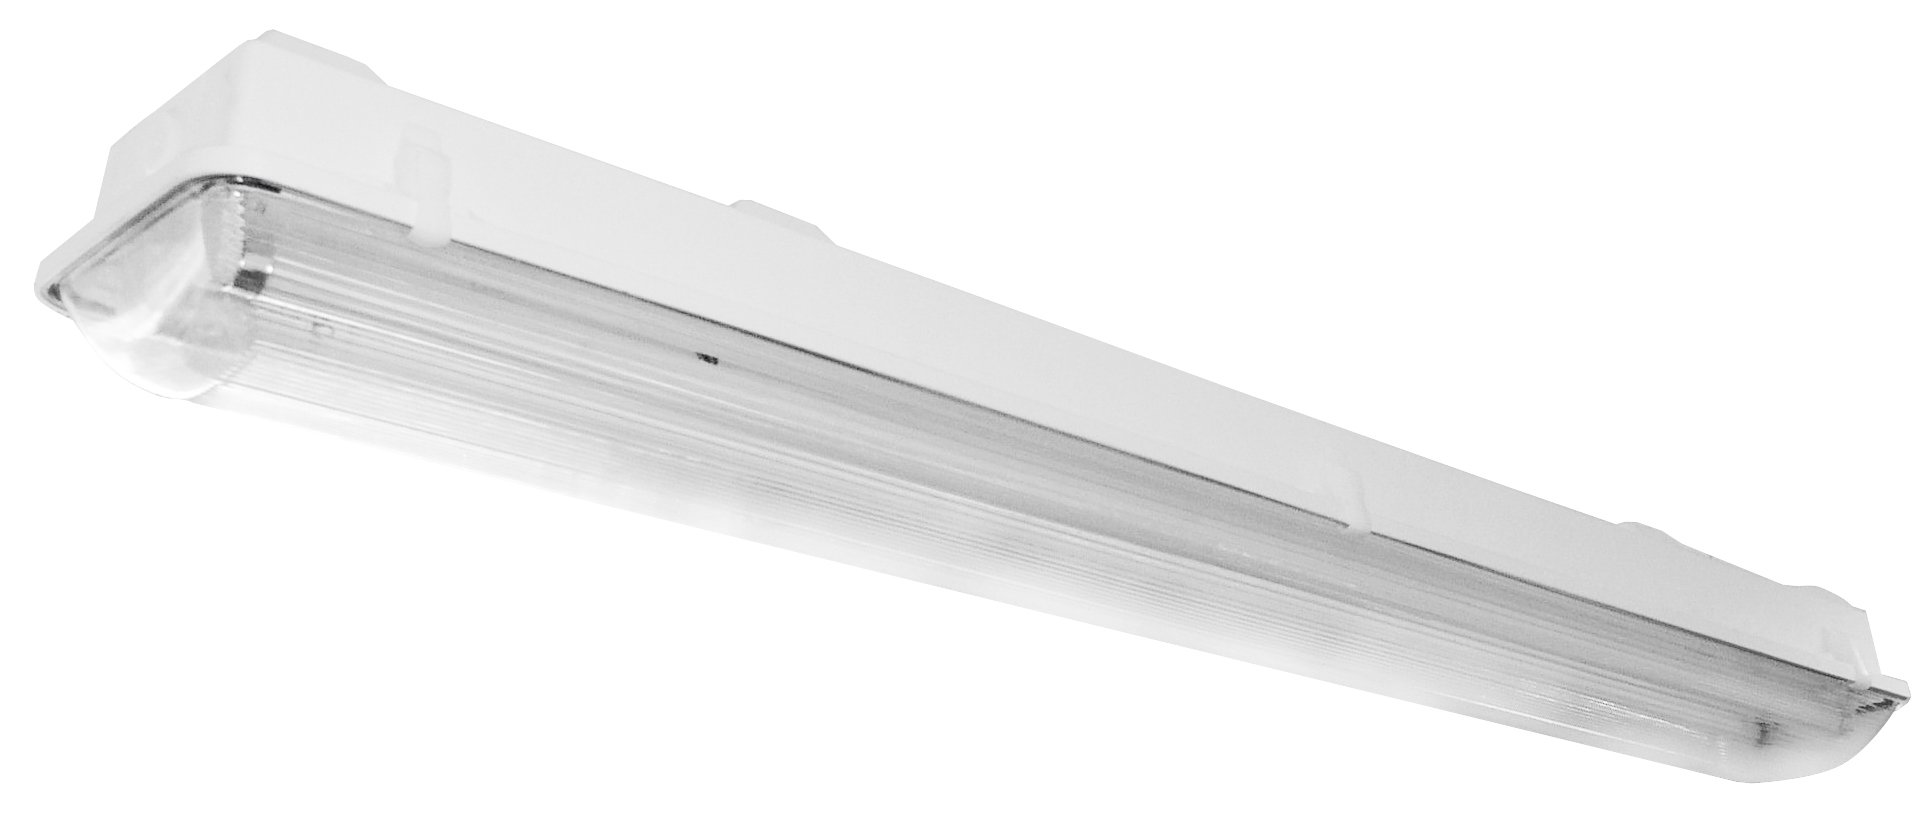 Lighting by AFX VTL254HOMV Industrial Grade Multi-Volt 2-32 Watt T12 Vaportite Light Fixture, Fiberglass Housing with Clear Acrylic Lens by Lighting by AFX